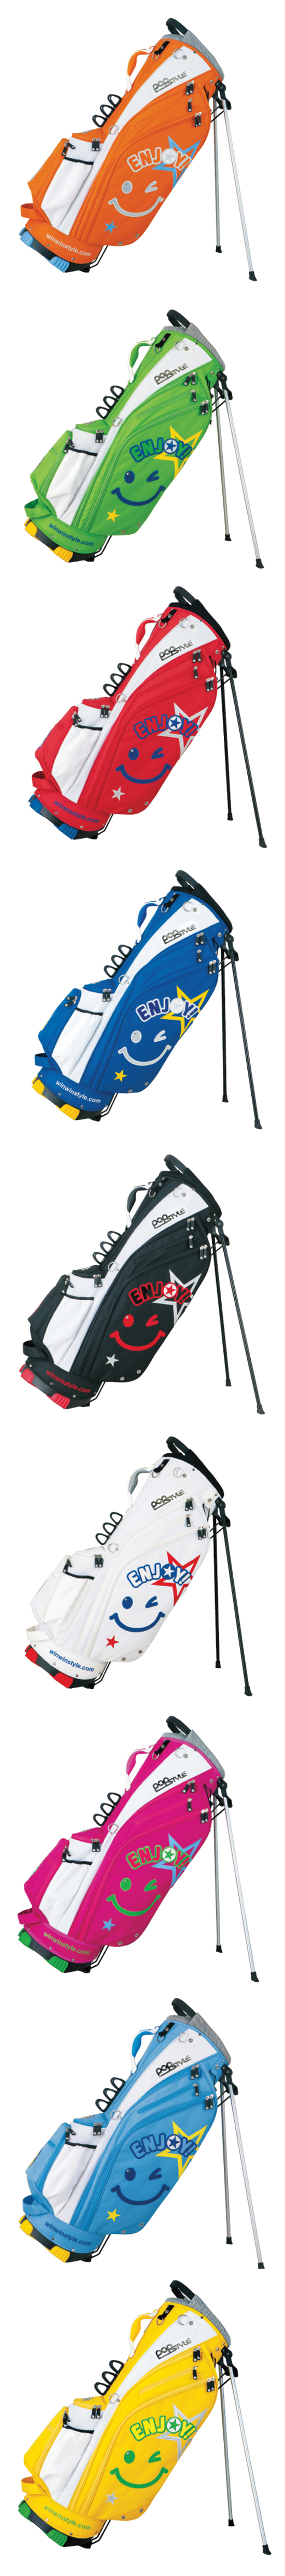 WinWin Style Enjoy Golf Stand Bag